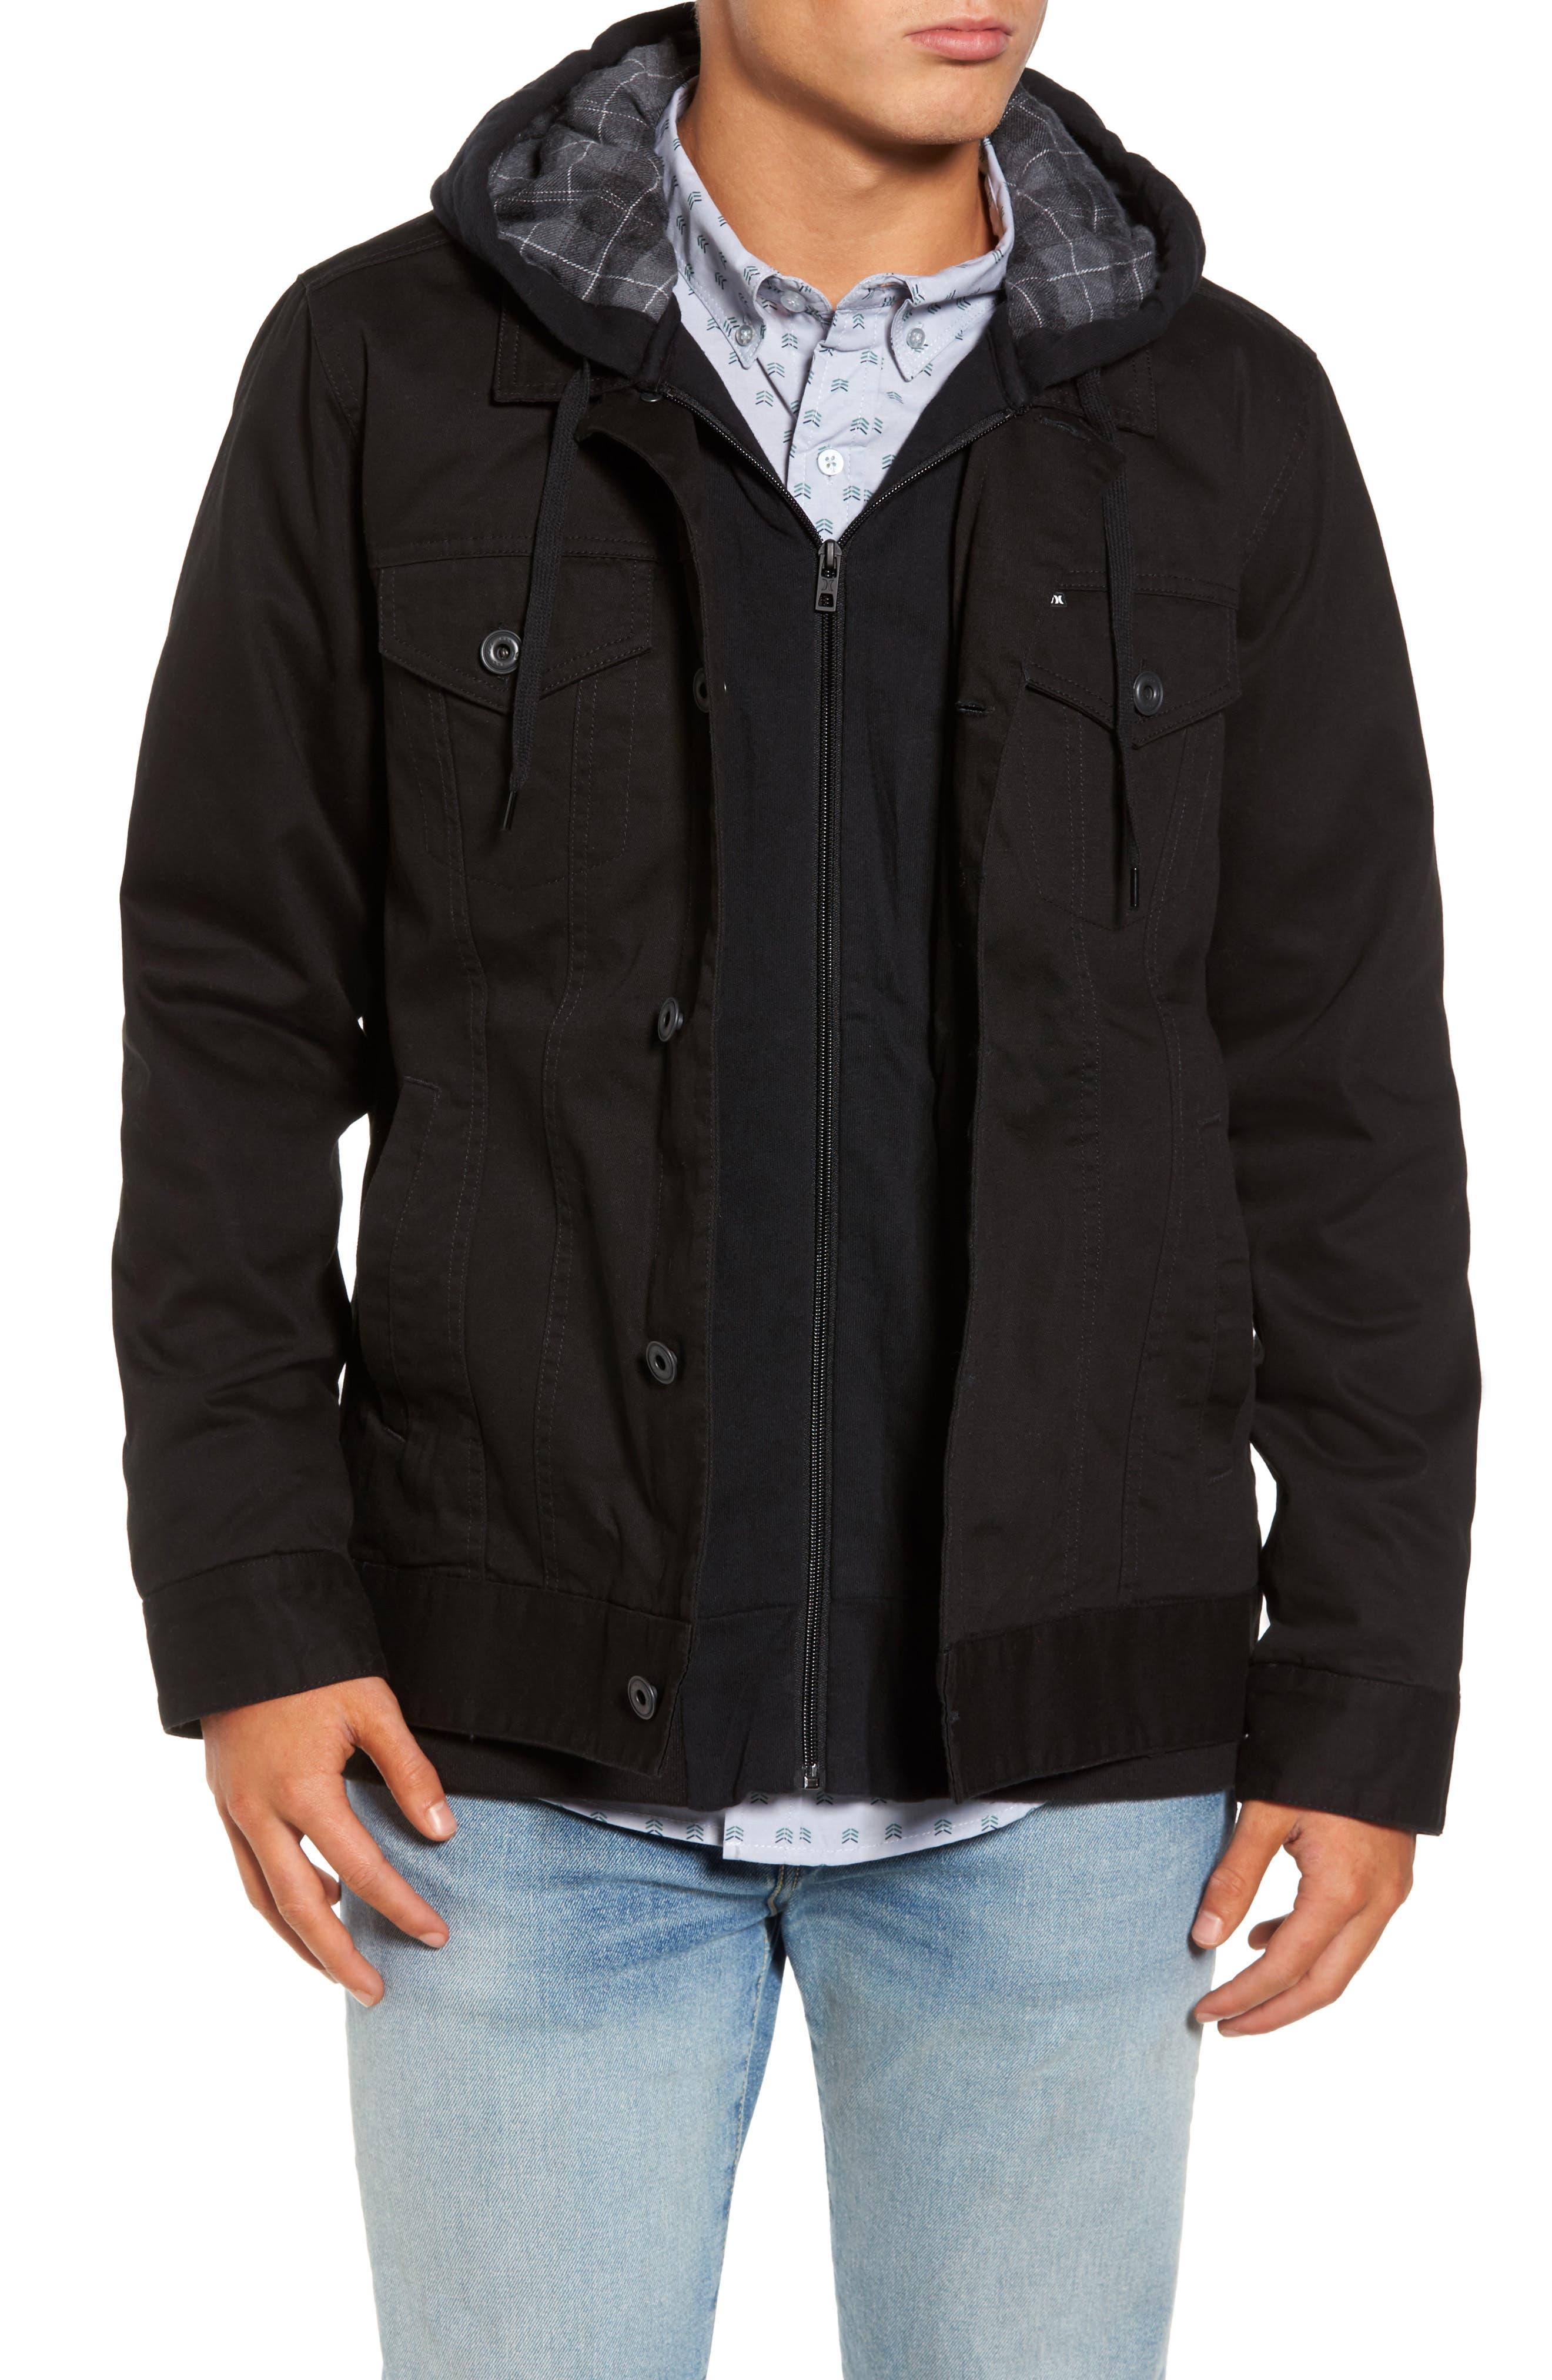 Main Image - Hurley Mac Trucker 3.0 Hooded Jacket